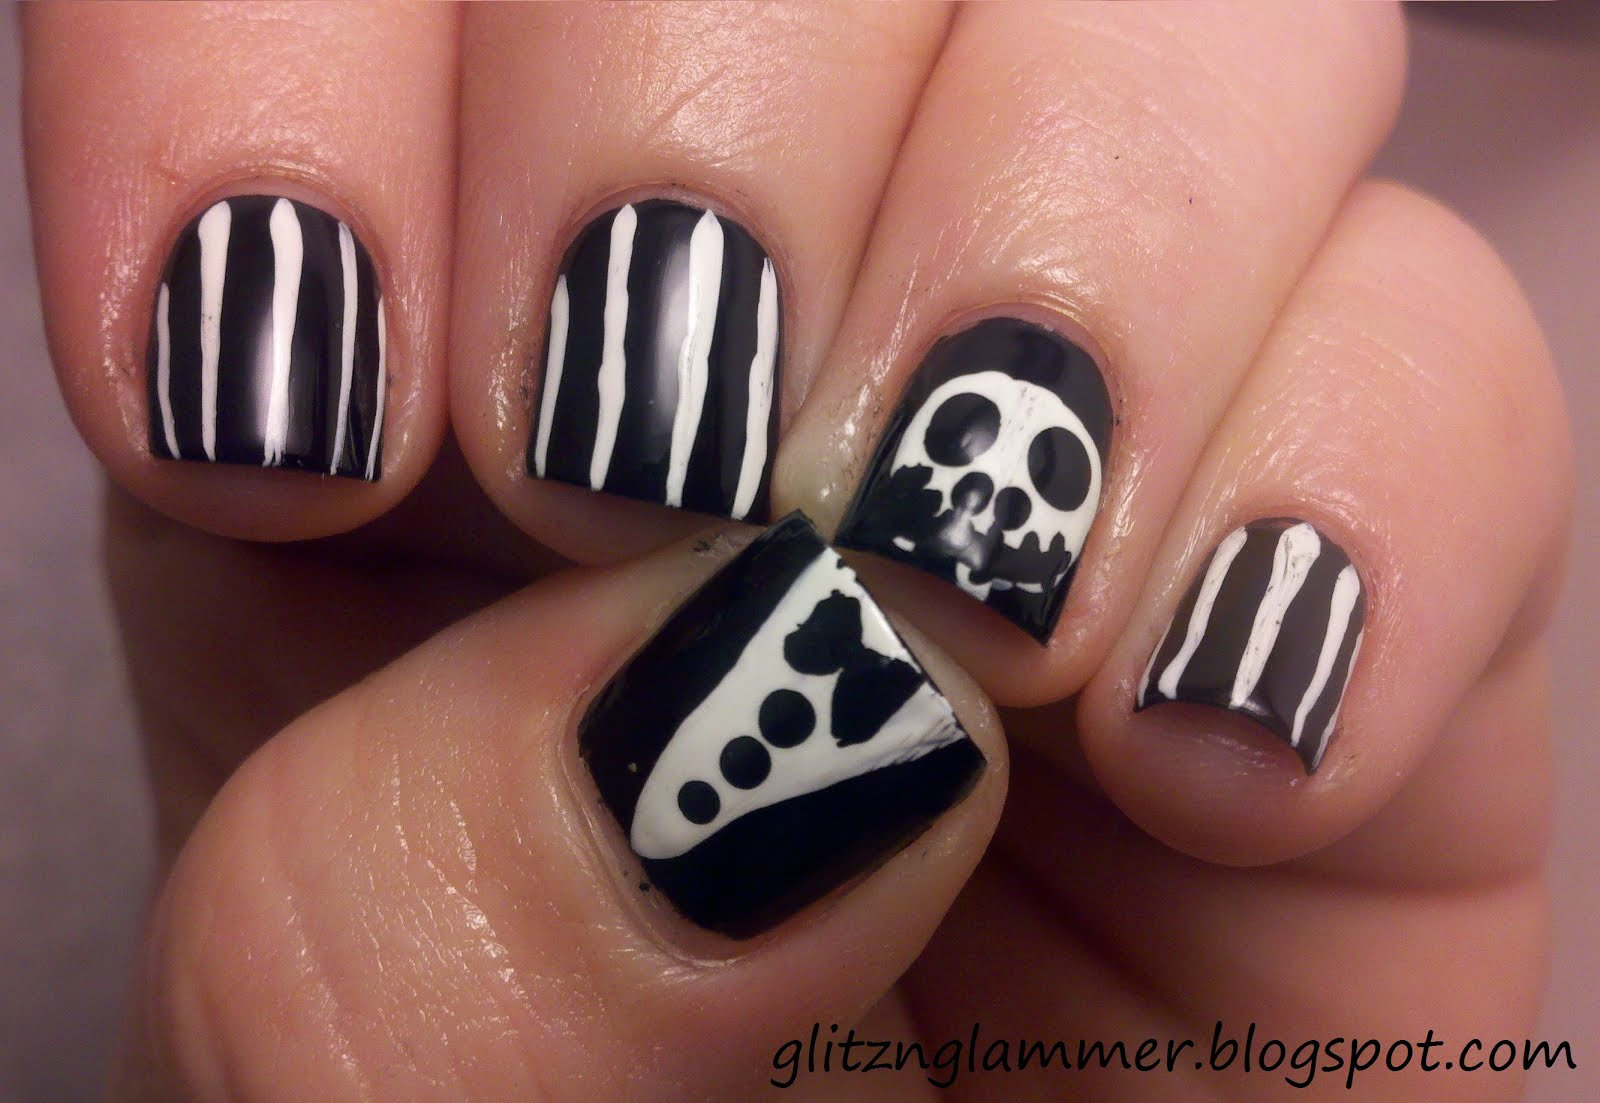 glitznglammer: halloween nail art challenge: halloween character